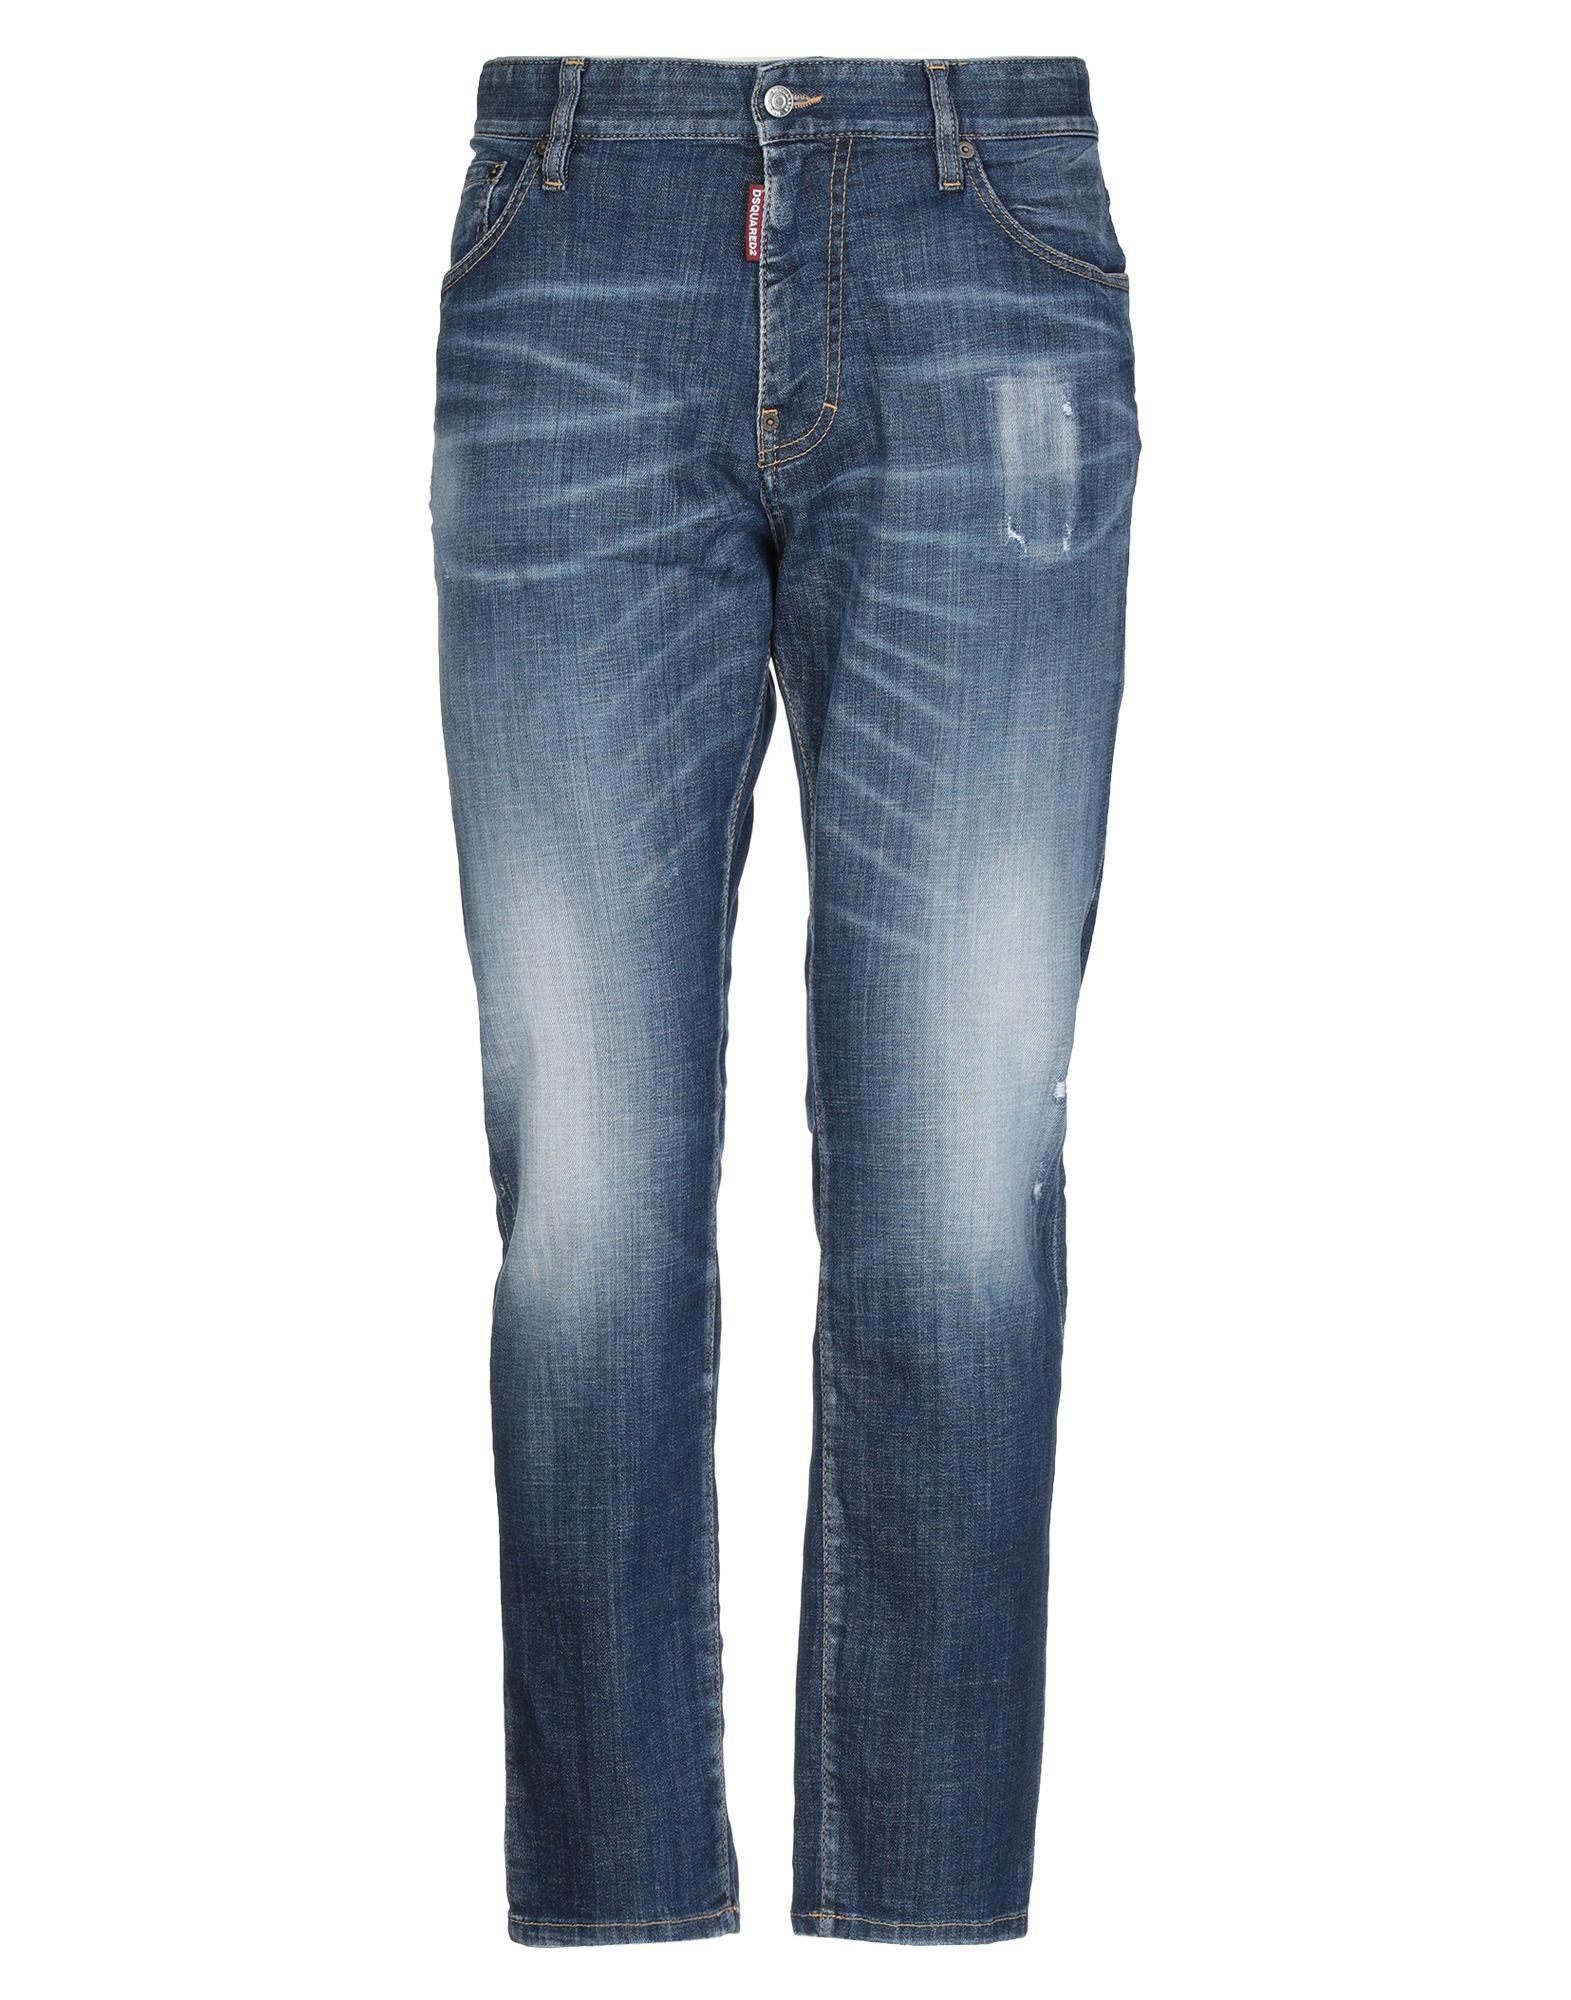 DSQUARED2 Denim pants - Item 42808044